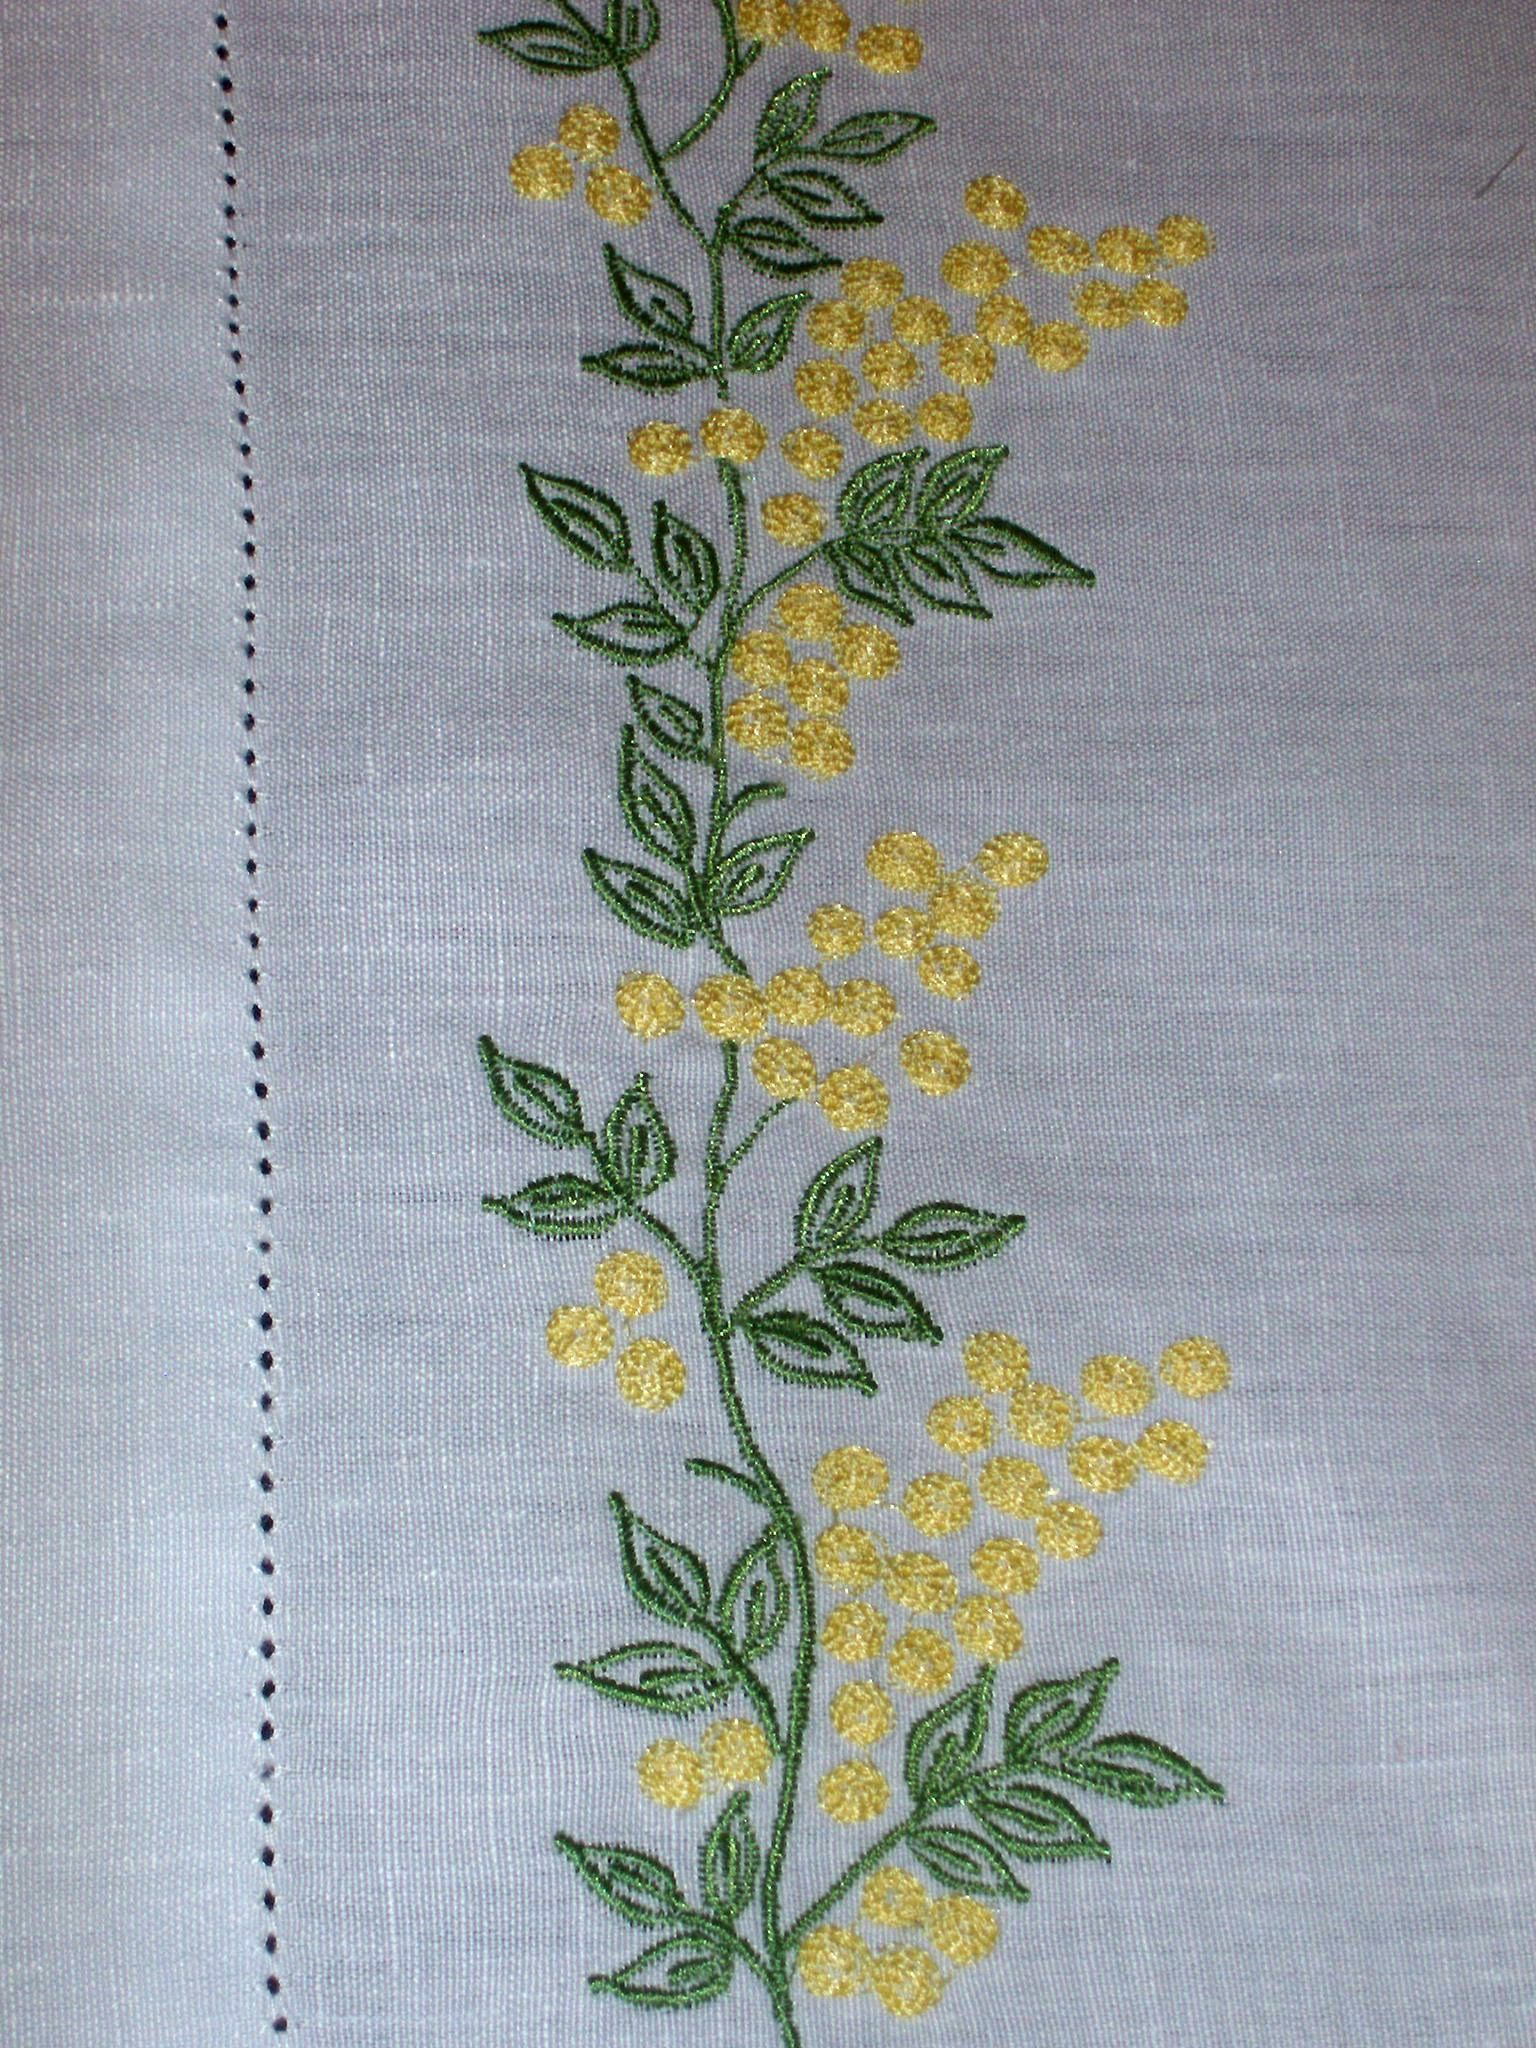 Pin by lotta noponenrenko on embroidery pinterest embroidery